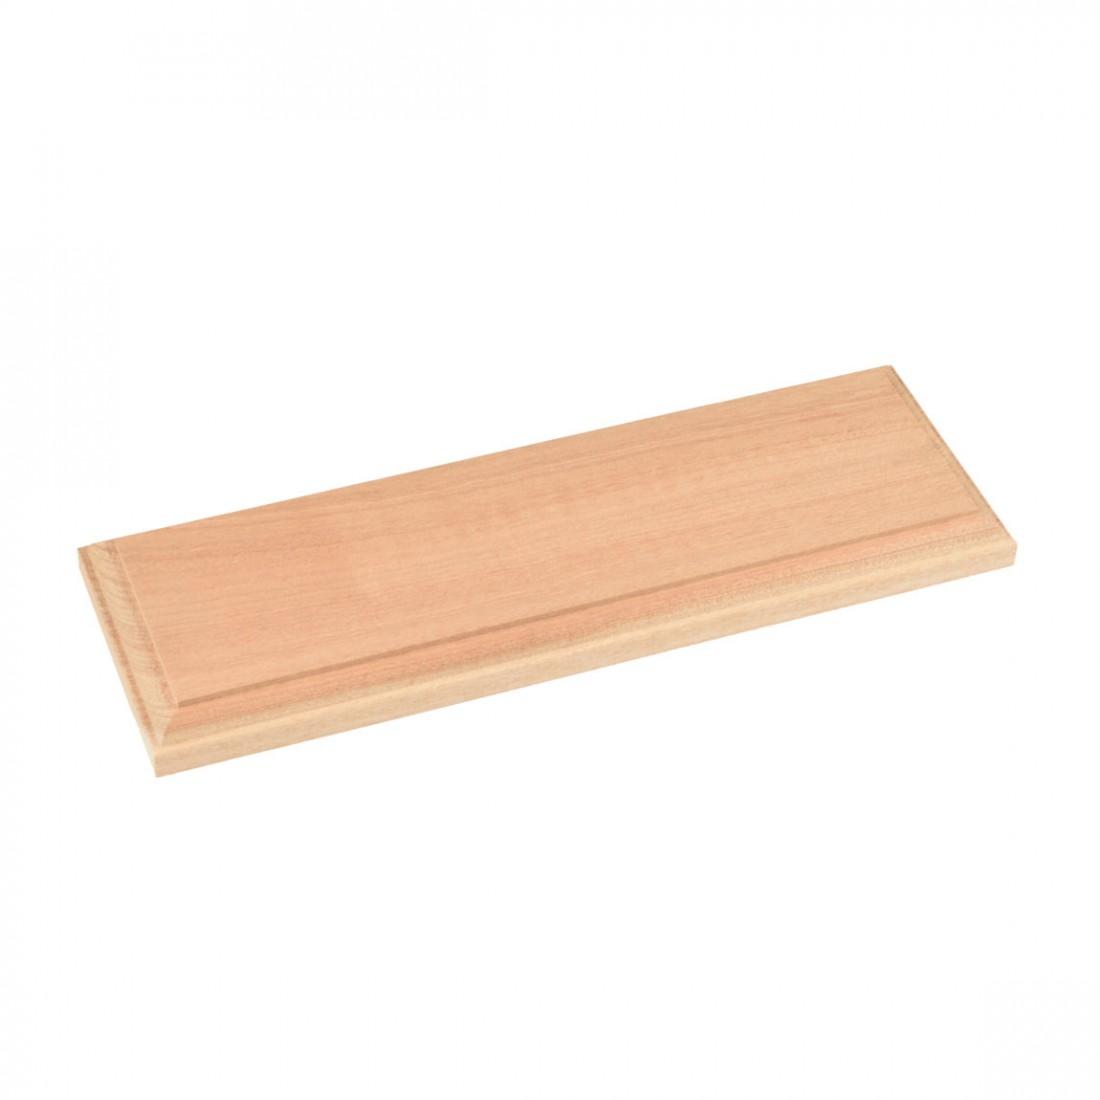 Zócalos de madera natural cm.30x10x2